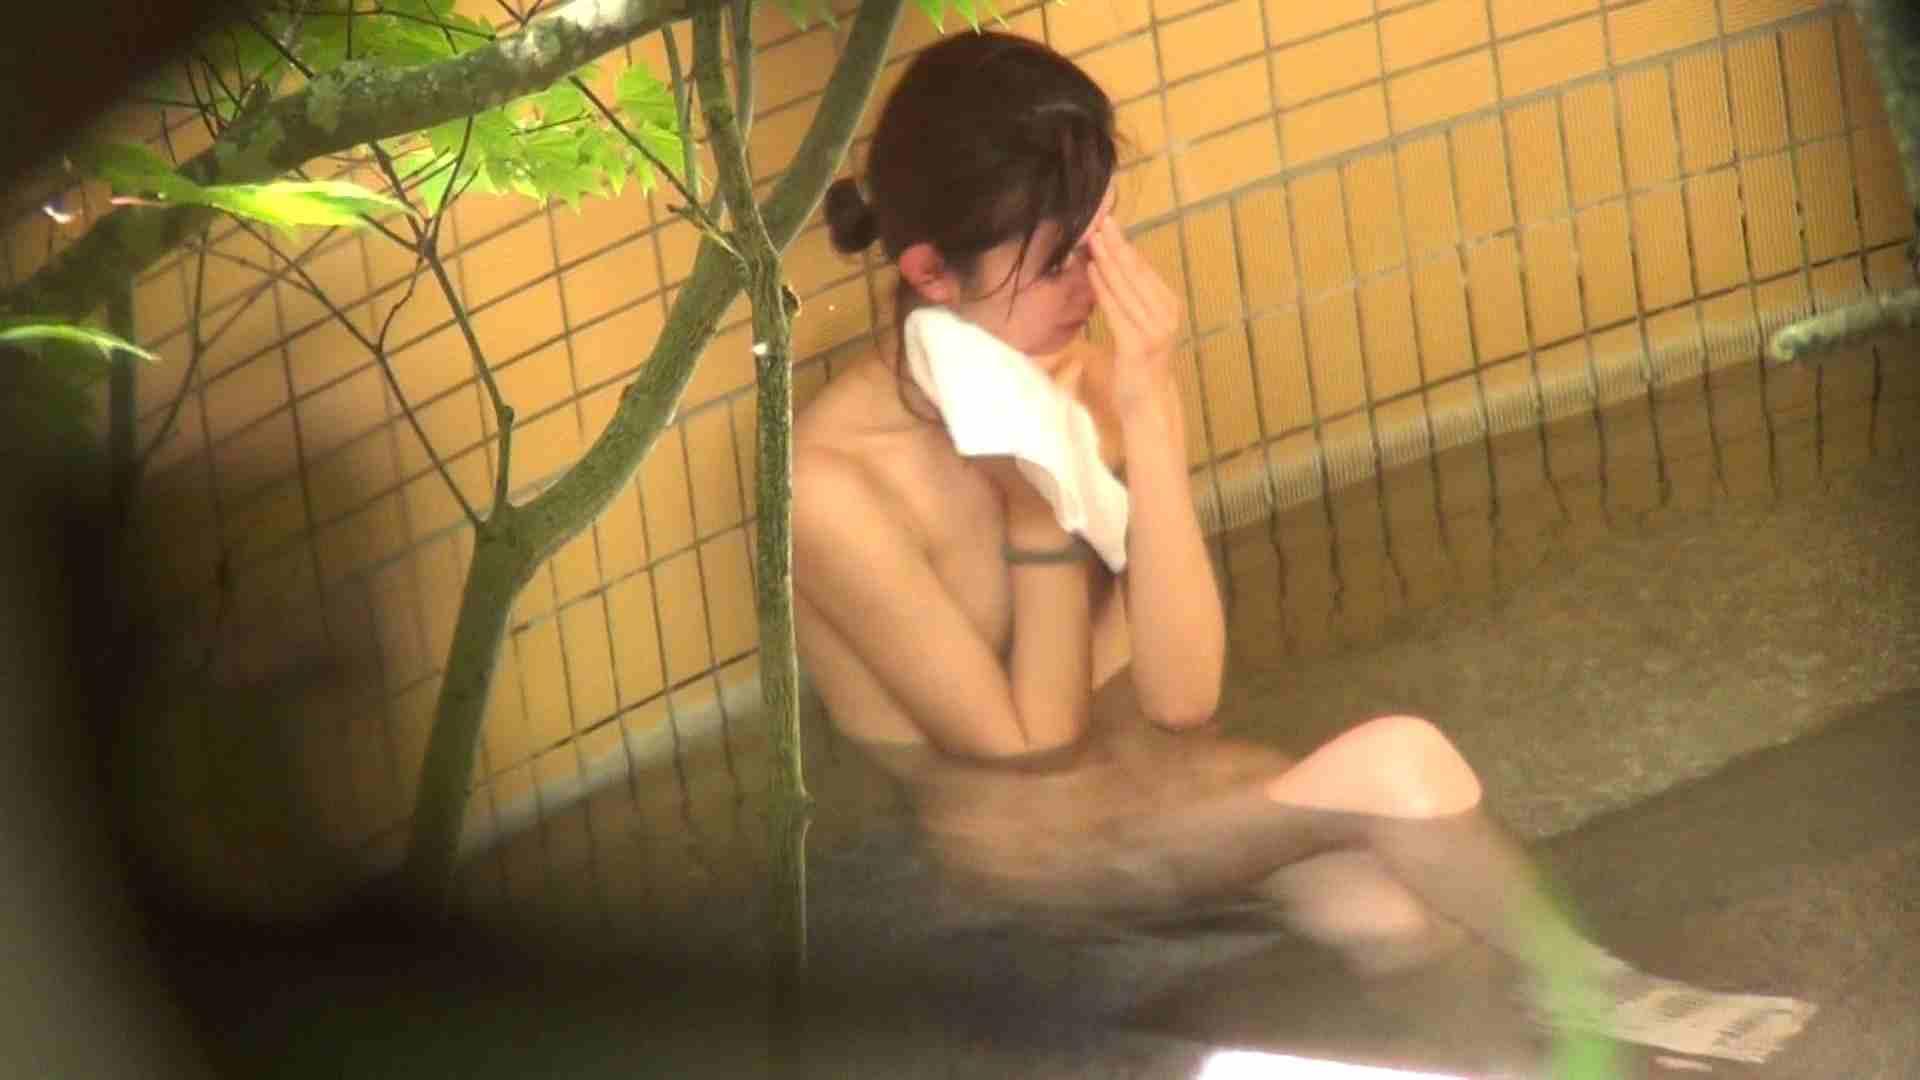 Aquaな露天風呂Vol.307 0   0  20連発 17